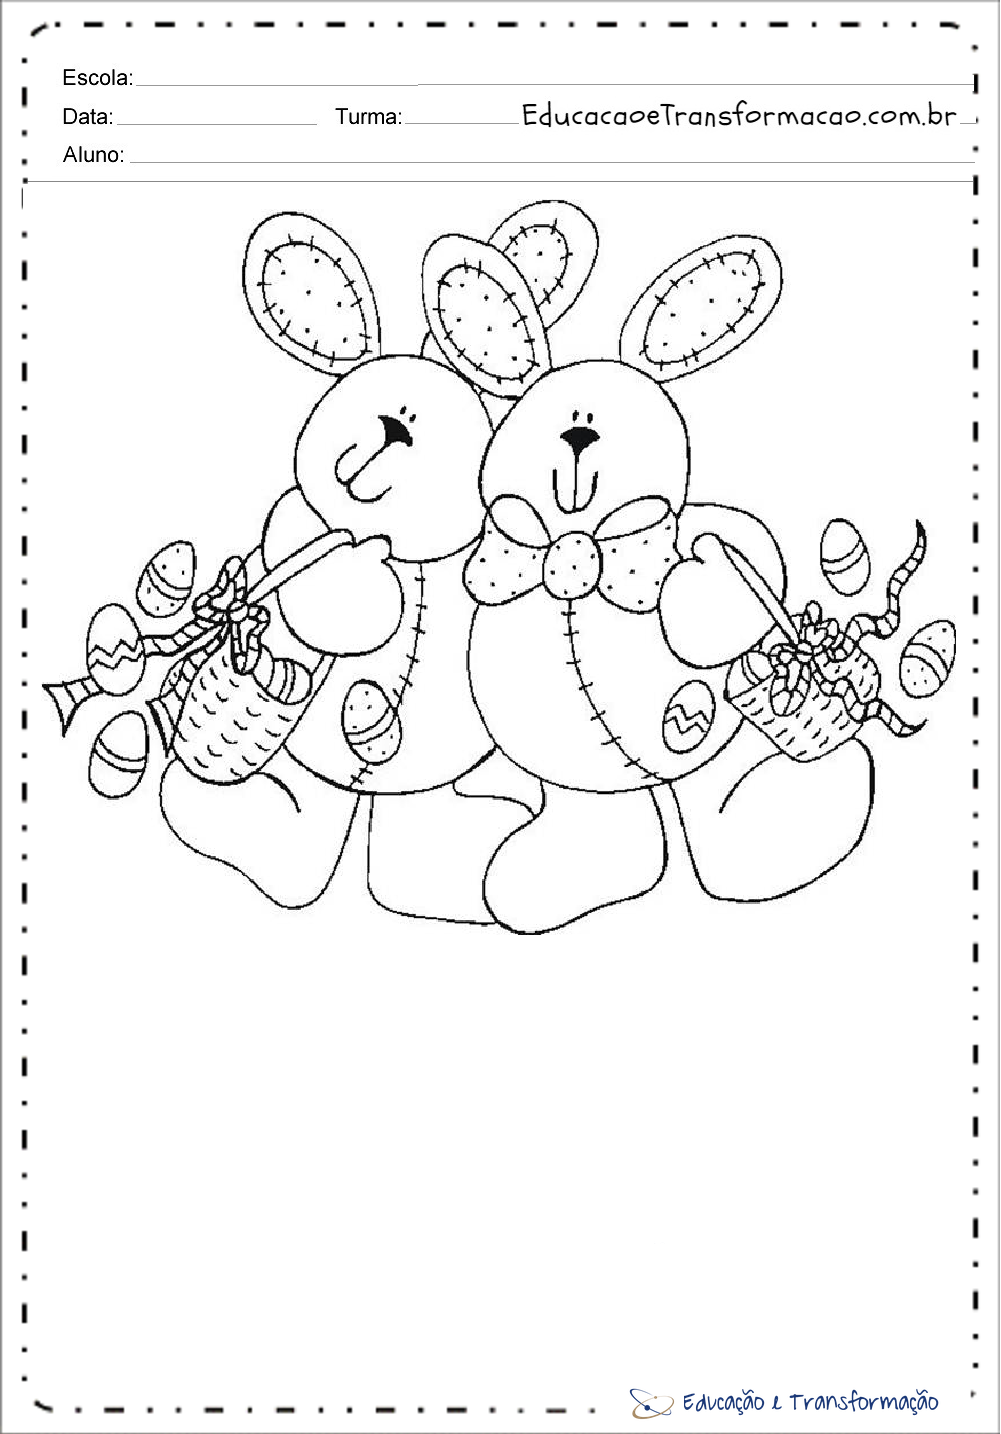 Atividades para Páscoa - Desenhos para colorir